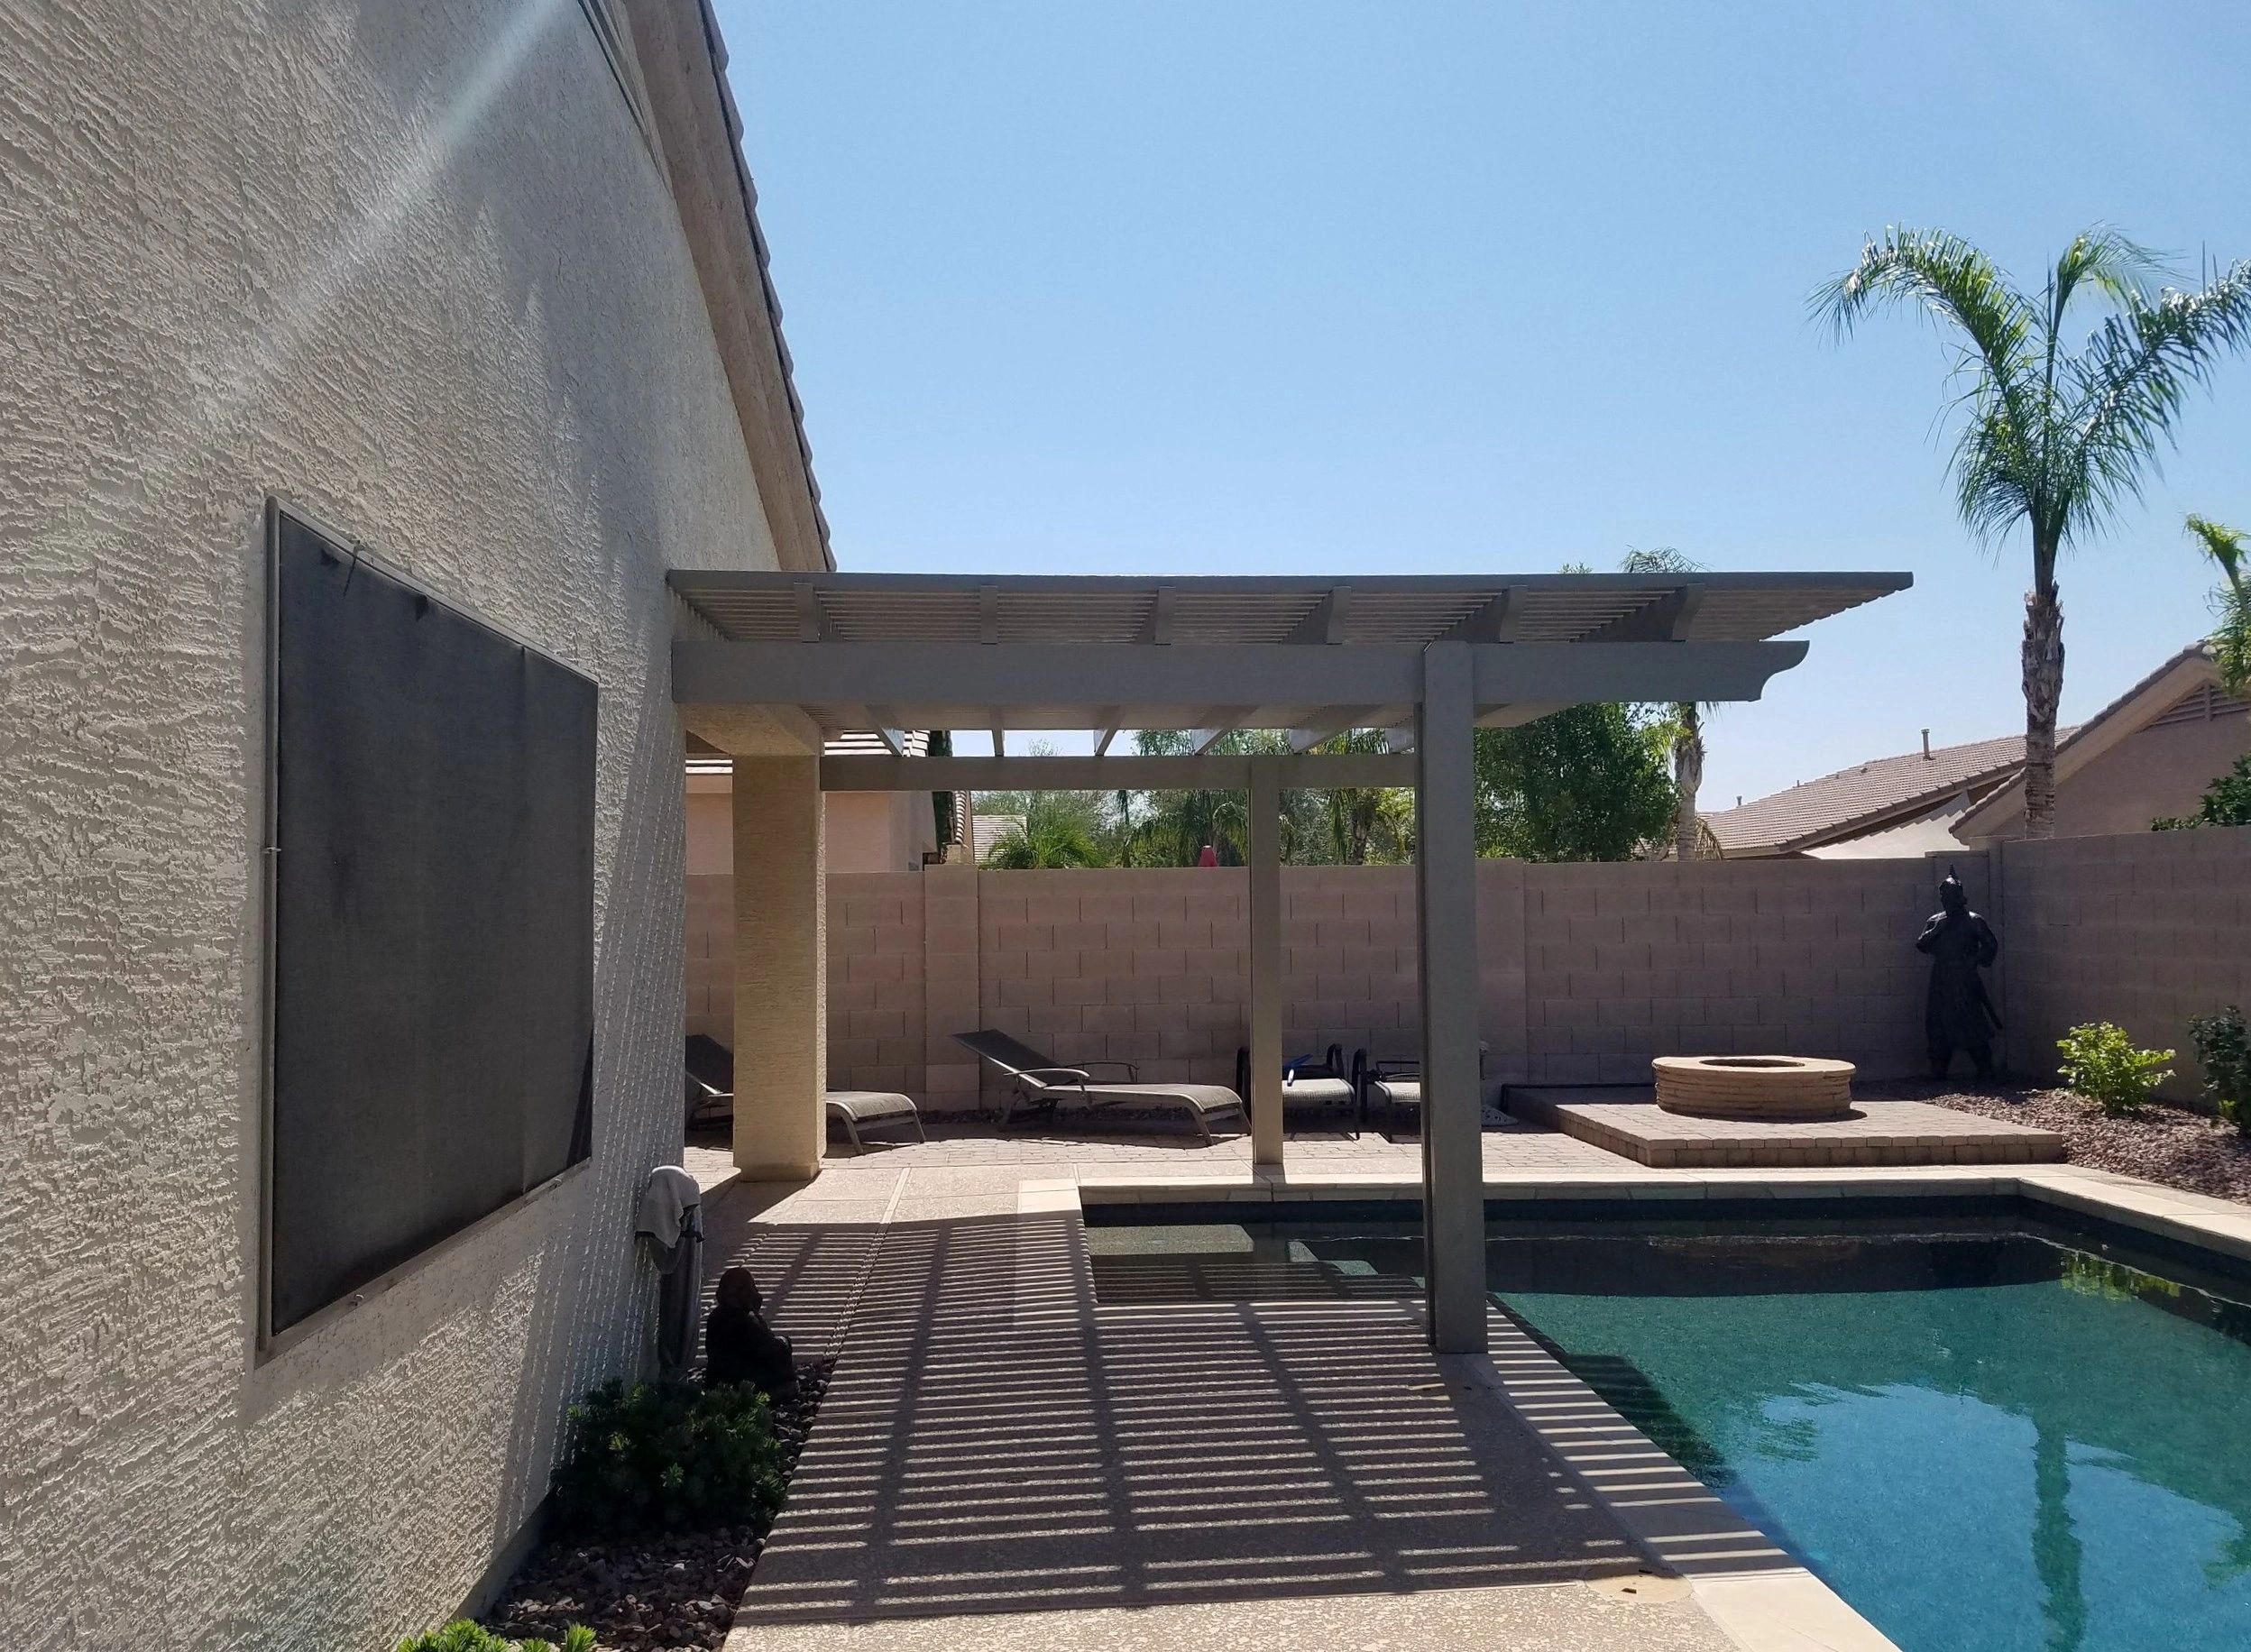 Roofing Desert Sun Protection Inc